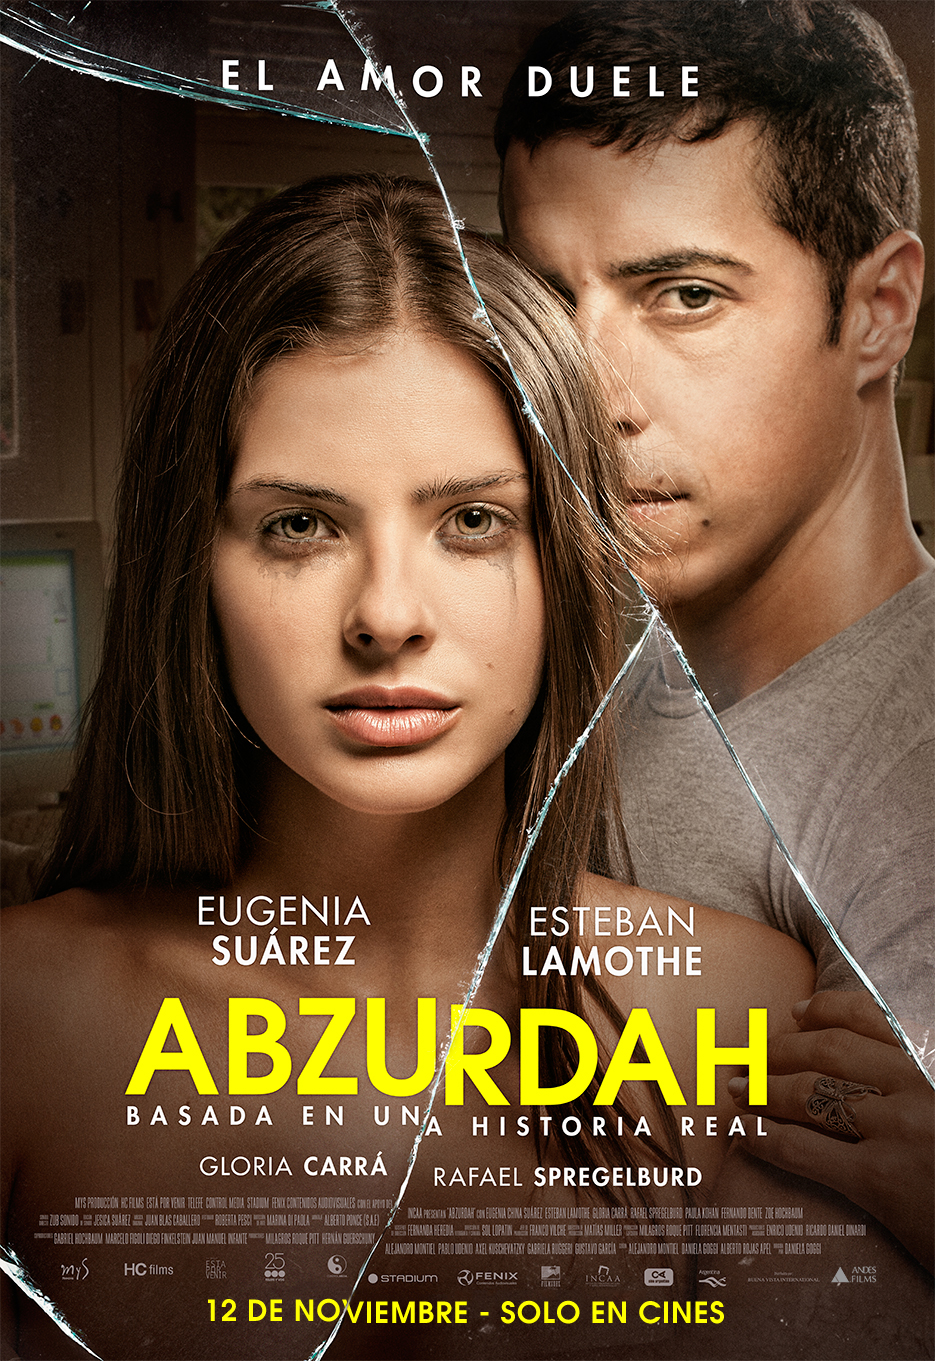 http://www.andesfilms.com.pe/abzurdah-1211/